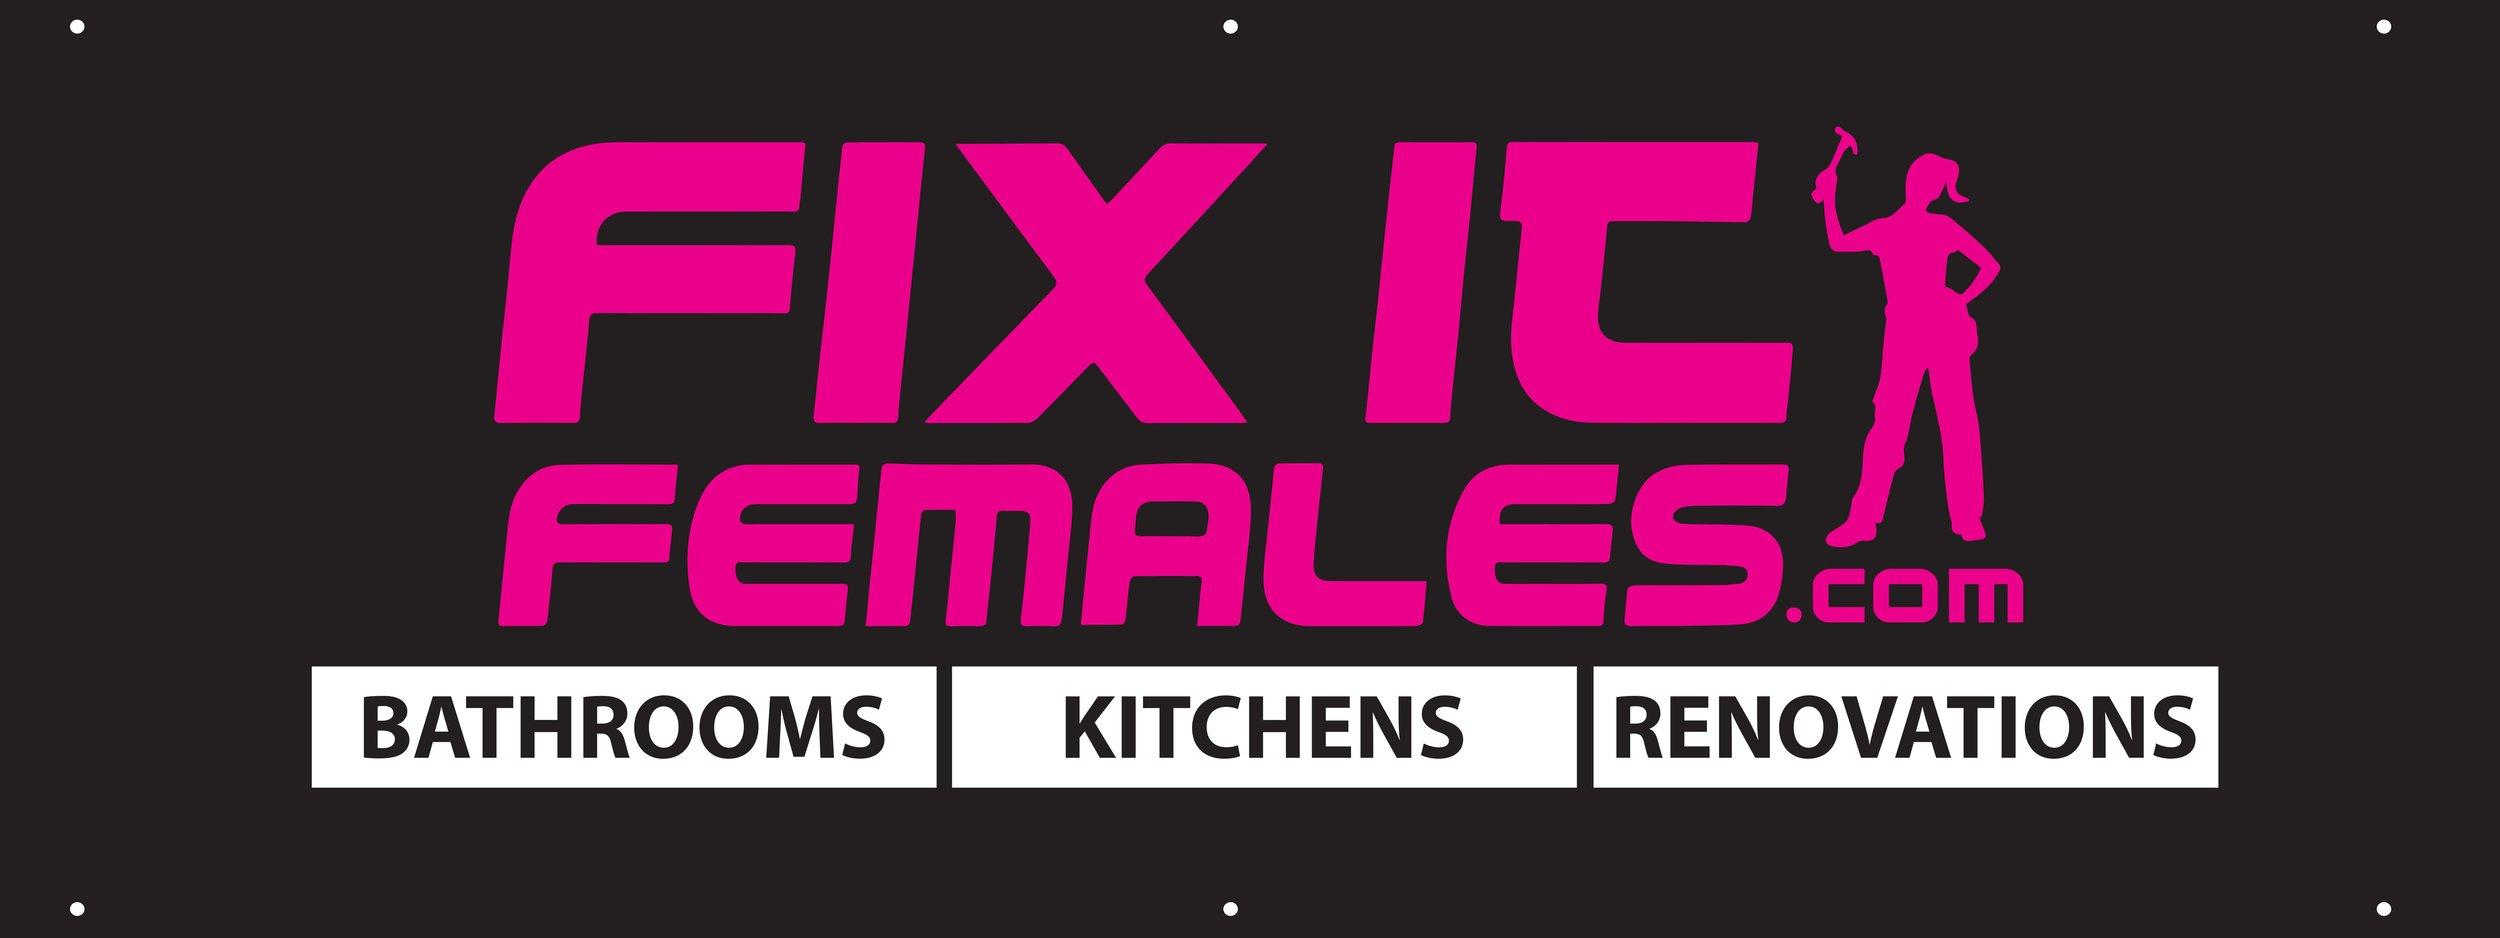 FixItFemales_V3.jpg